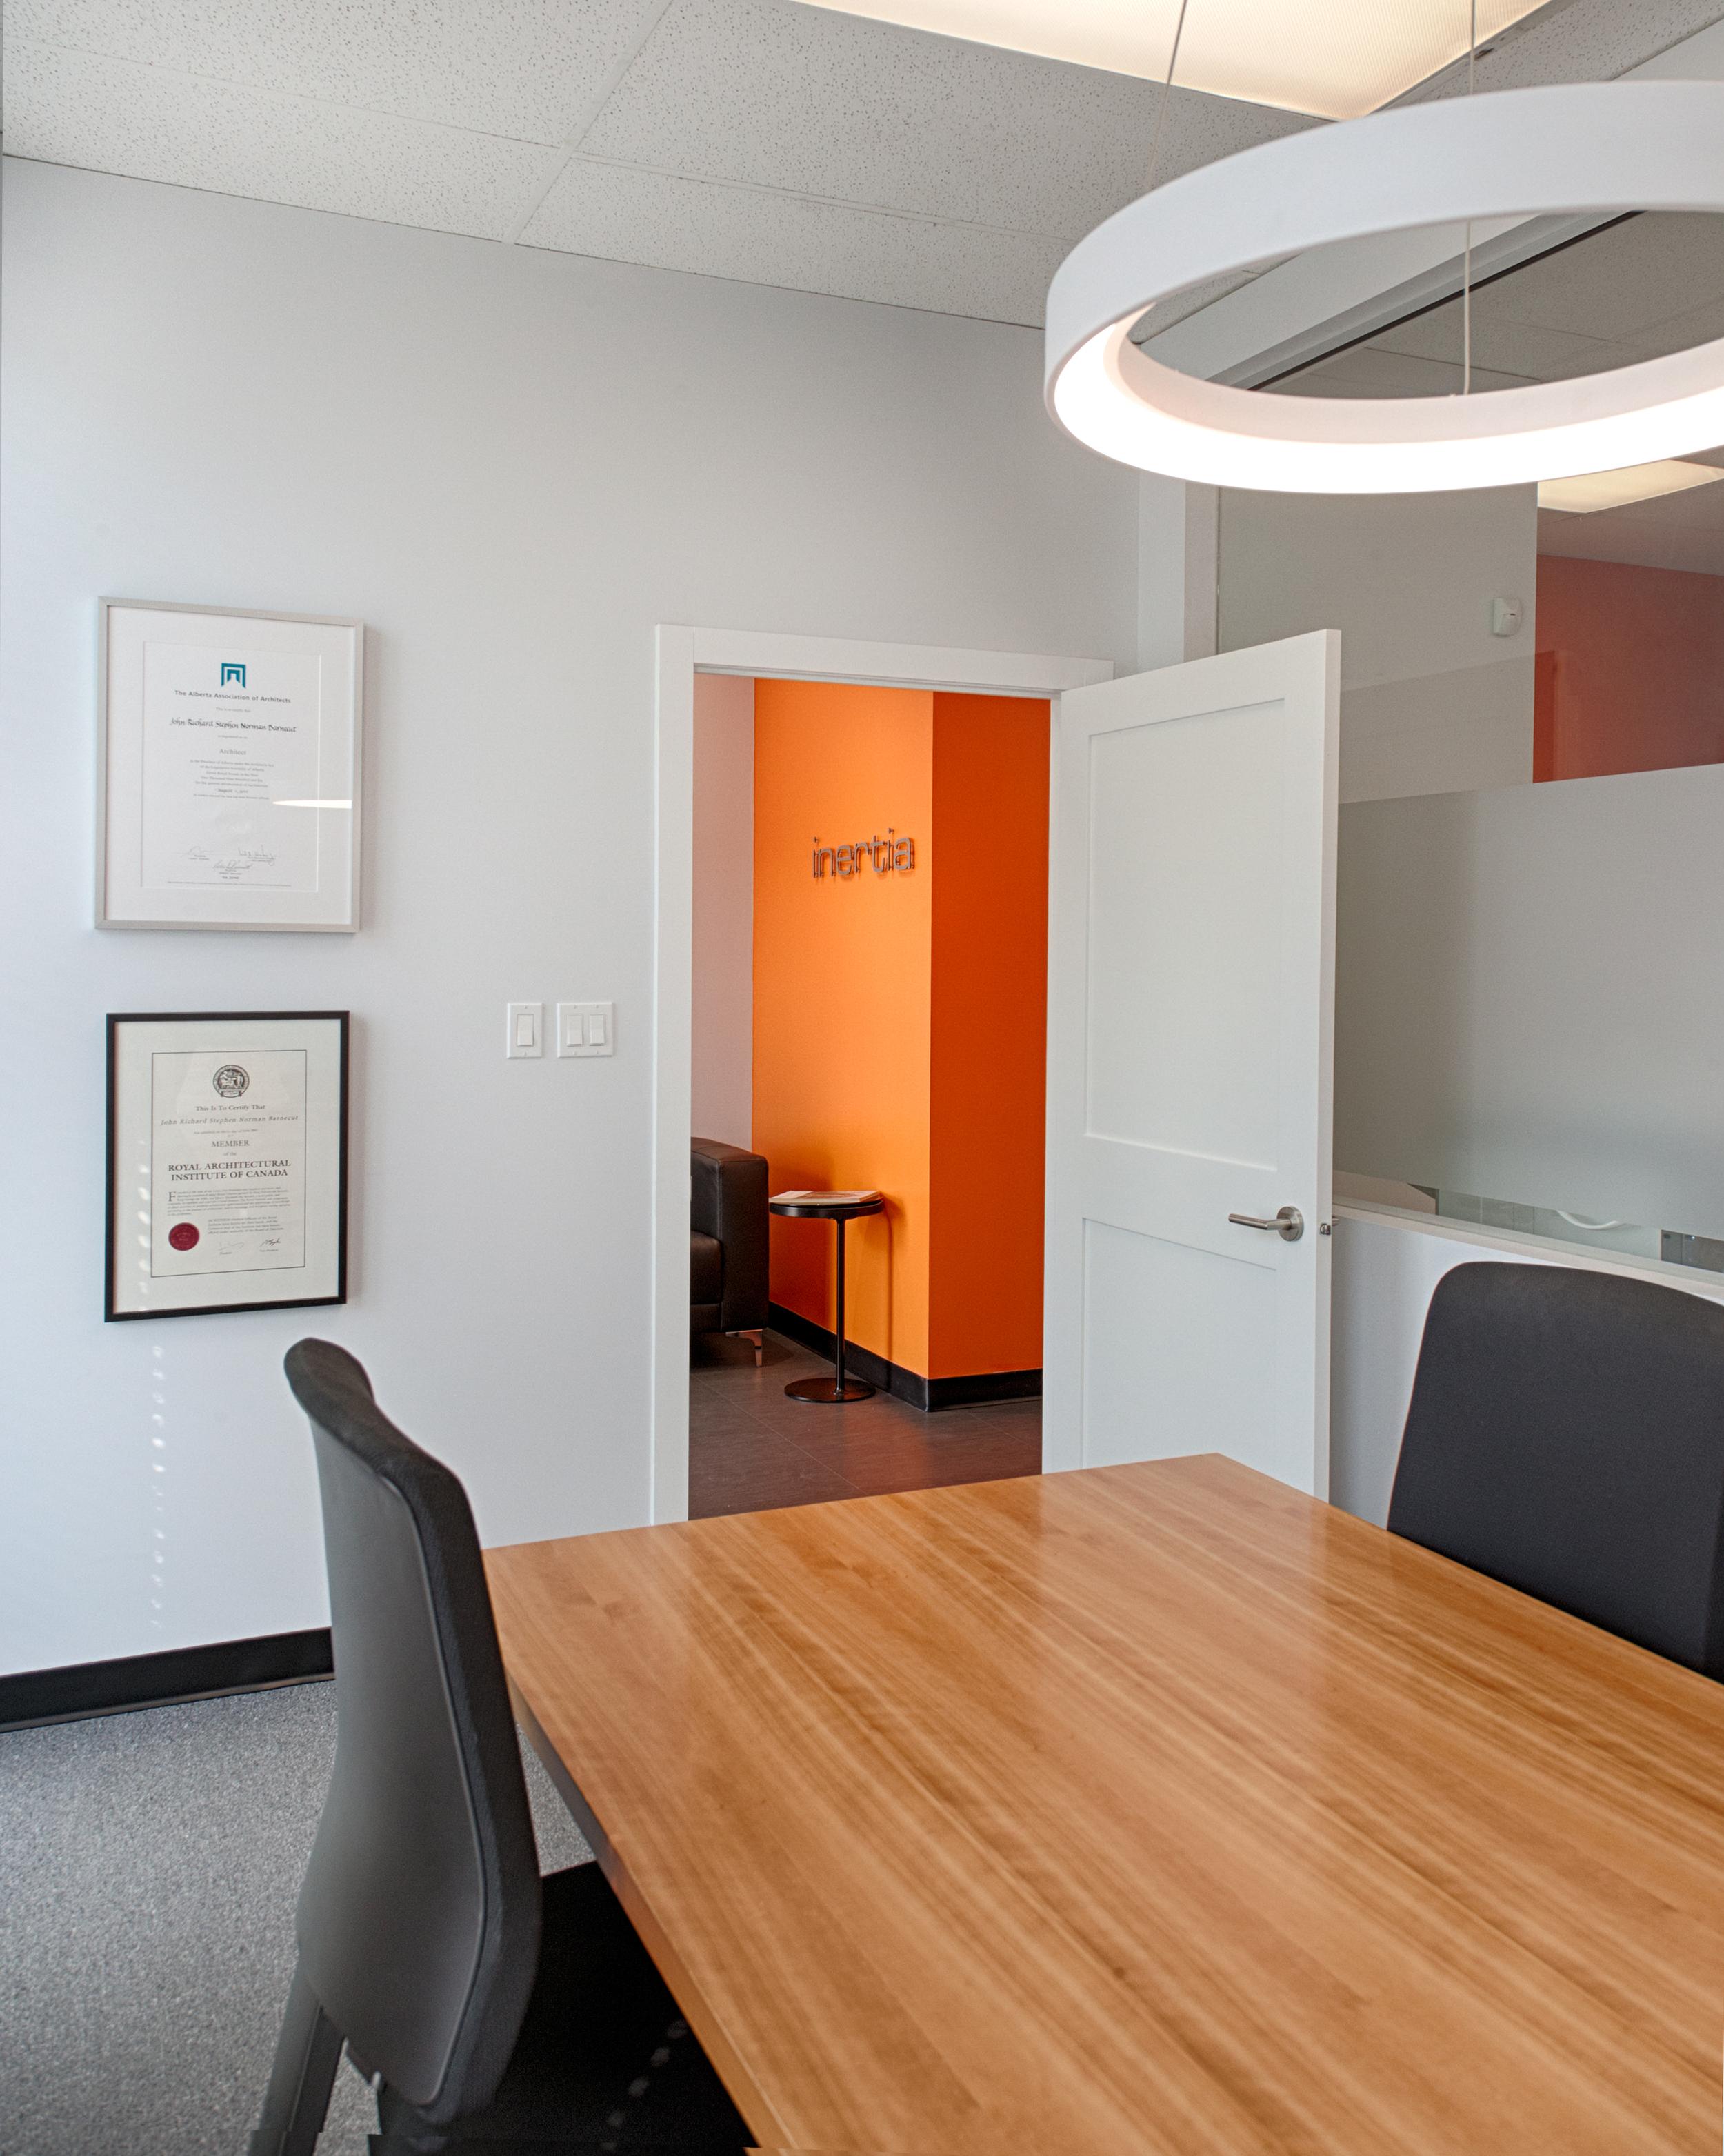 Inertia Boardroom